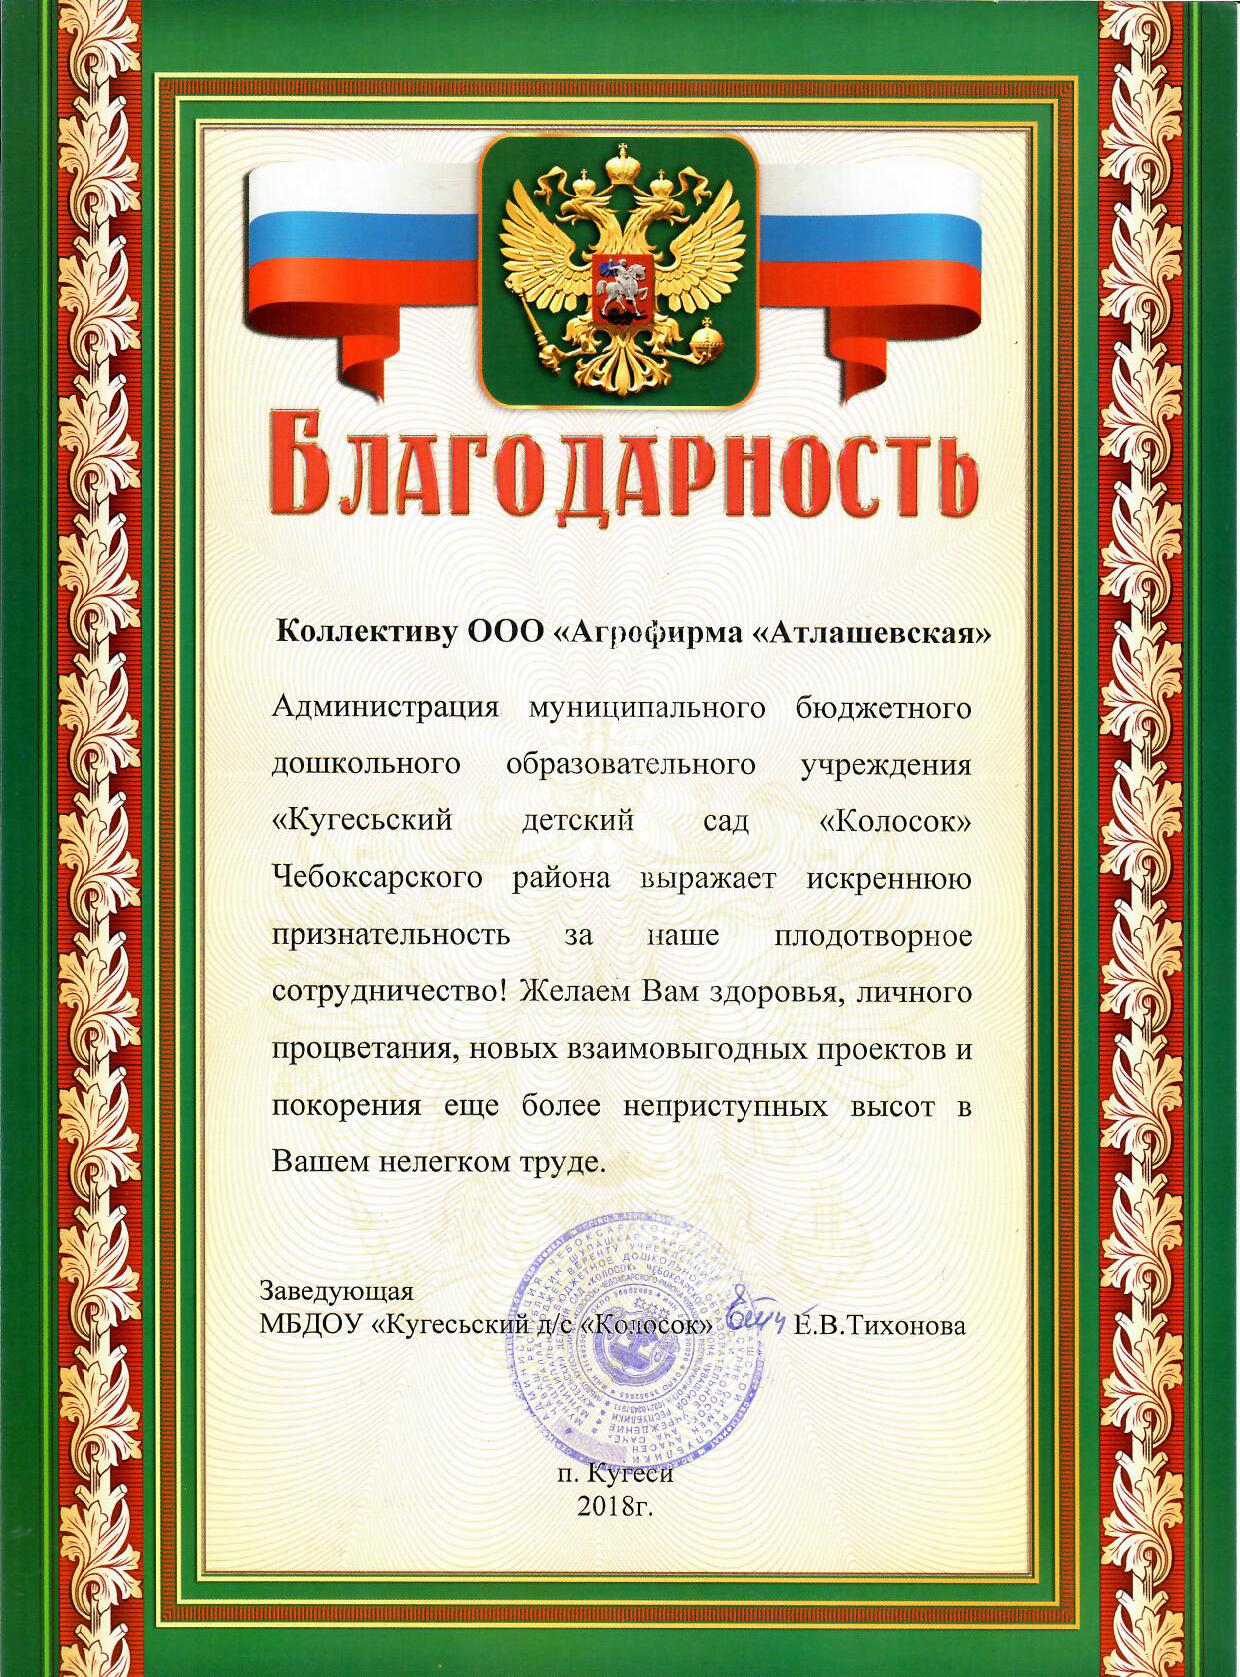 https://static-sl.insales.ru/files/1/6049/4904865/original/Kugesi-SOSH.jpg